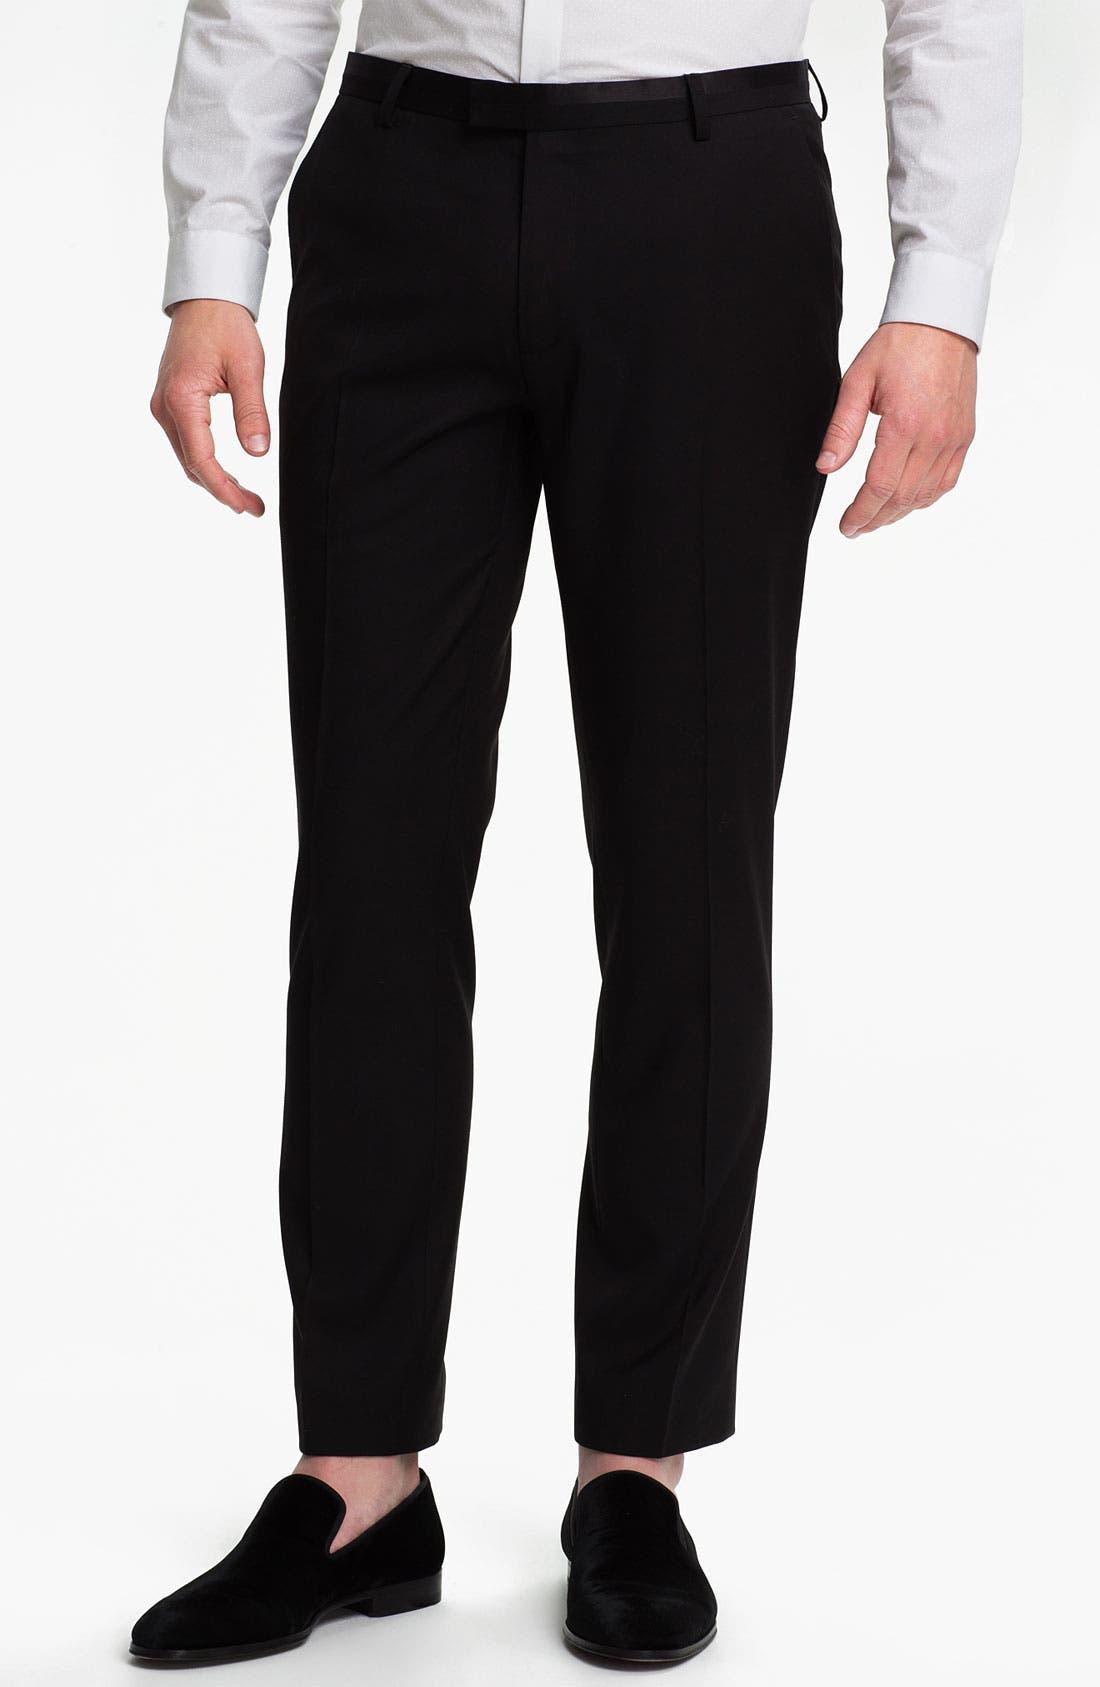 Main Image - Topman Black Satin Trim Trousers